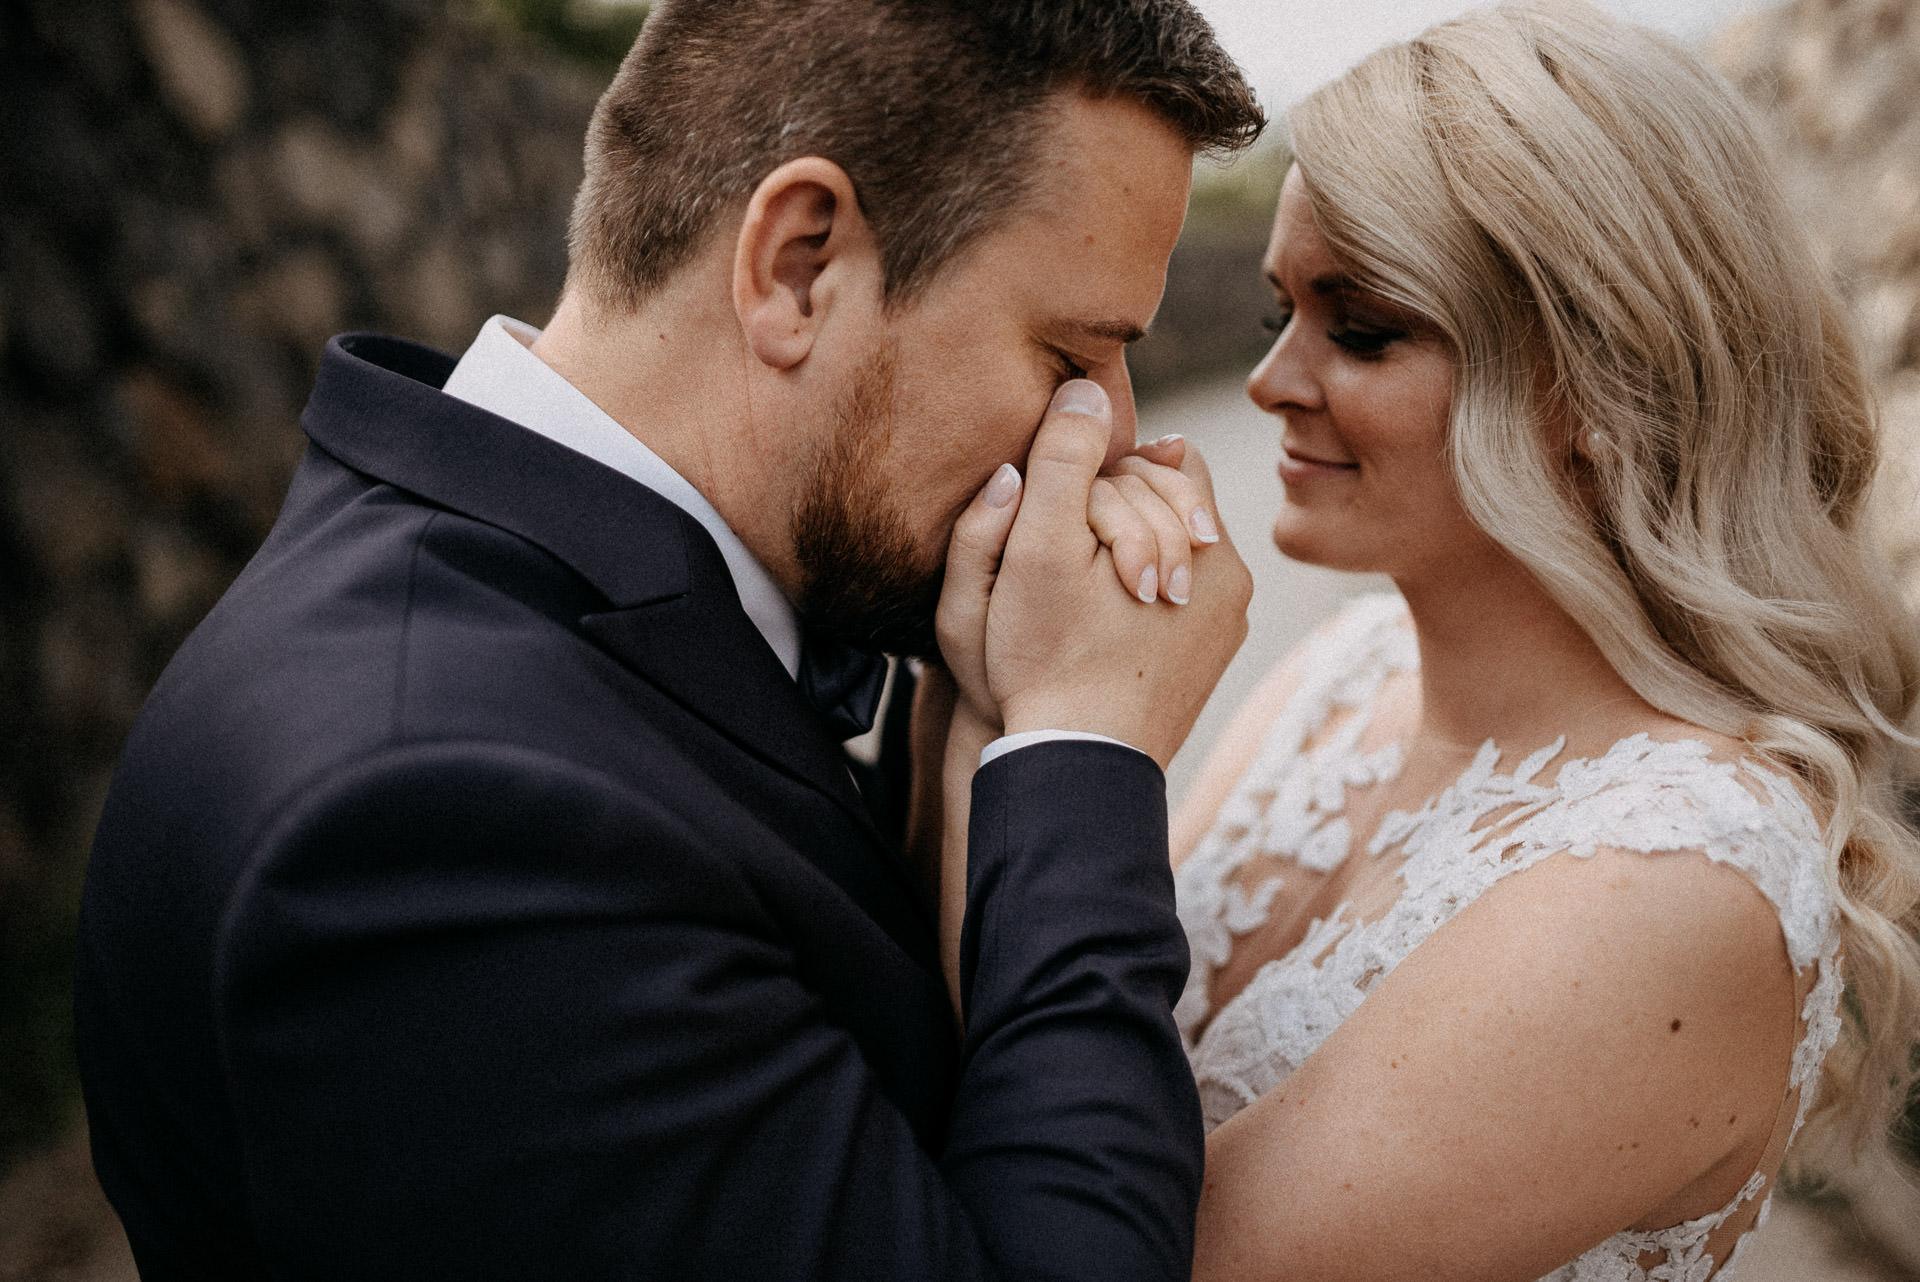 kiss kissing hands bride groom